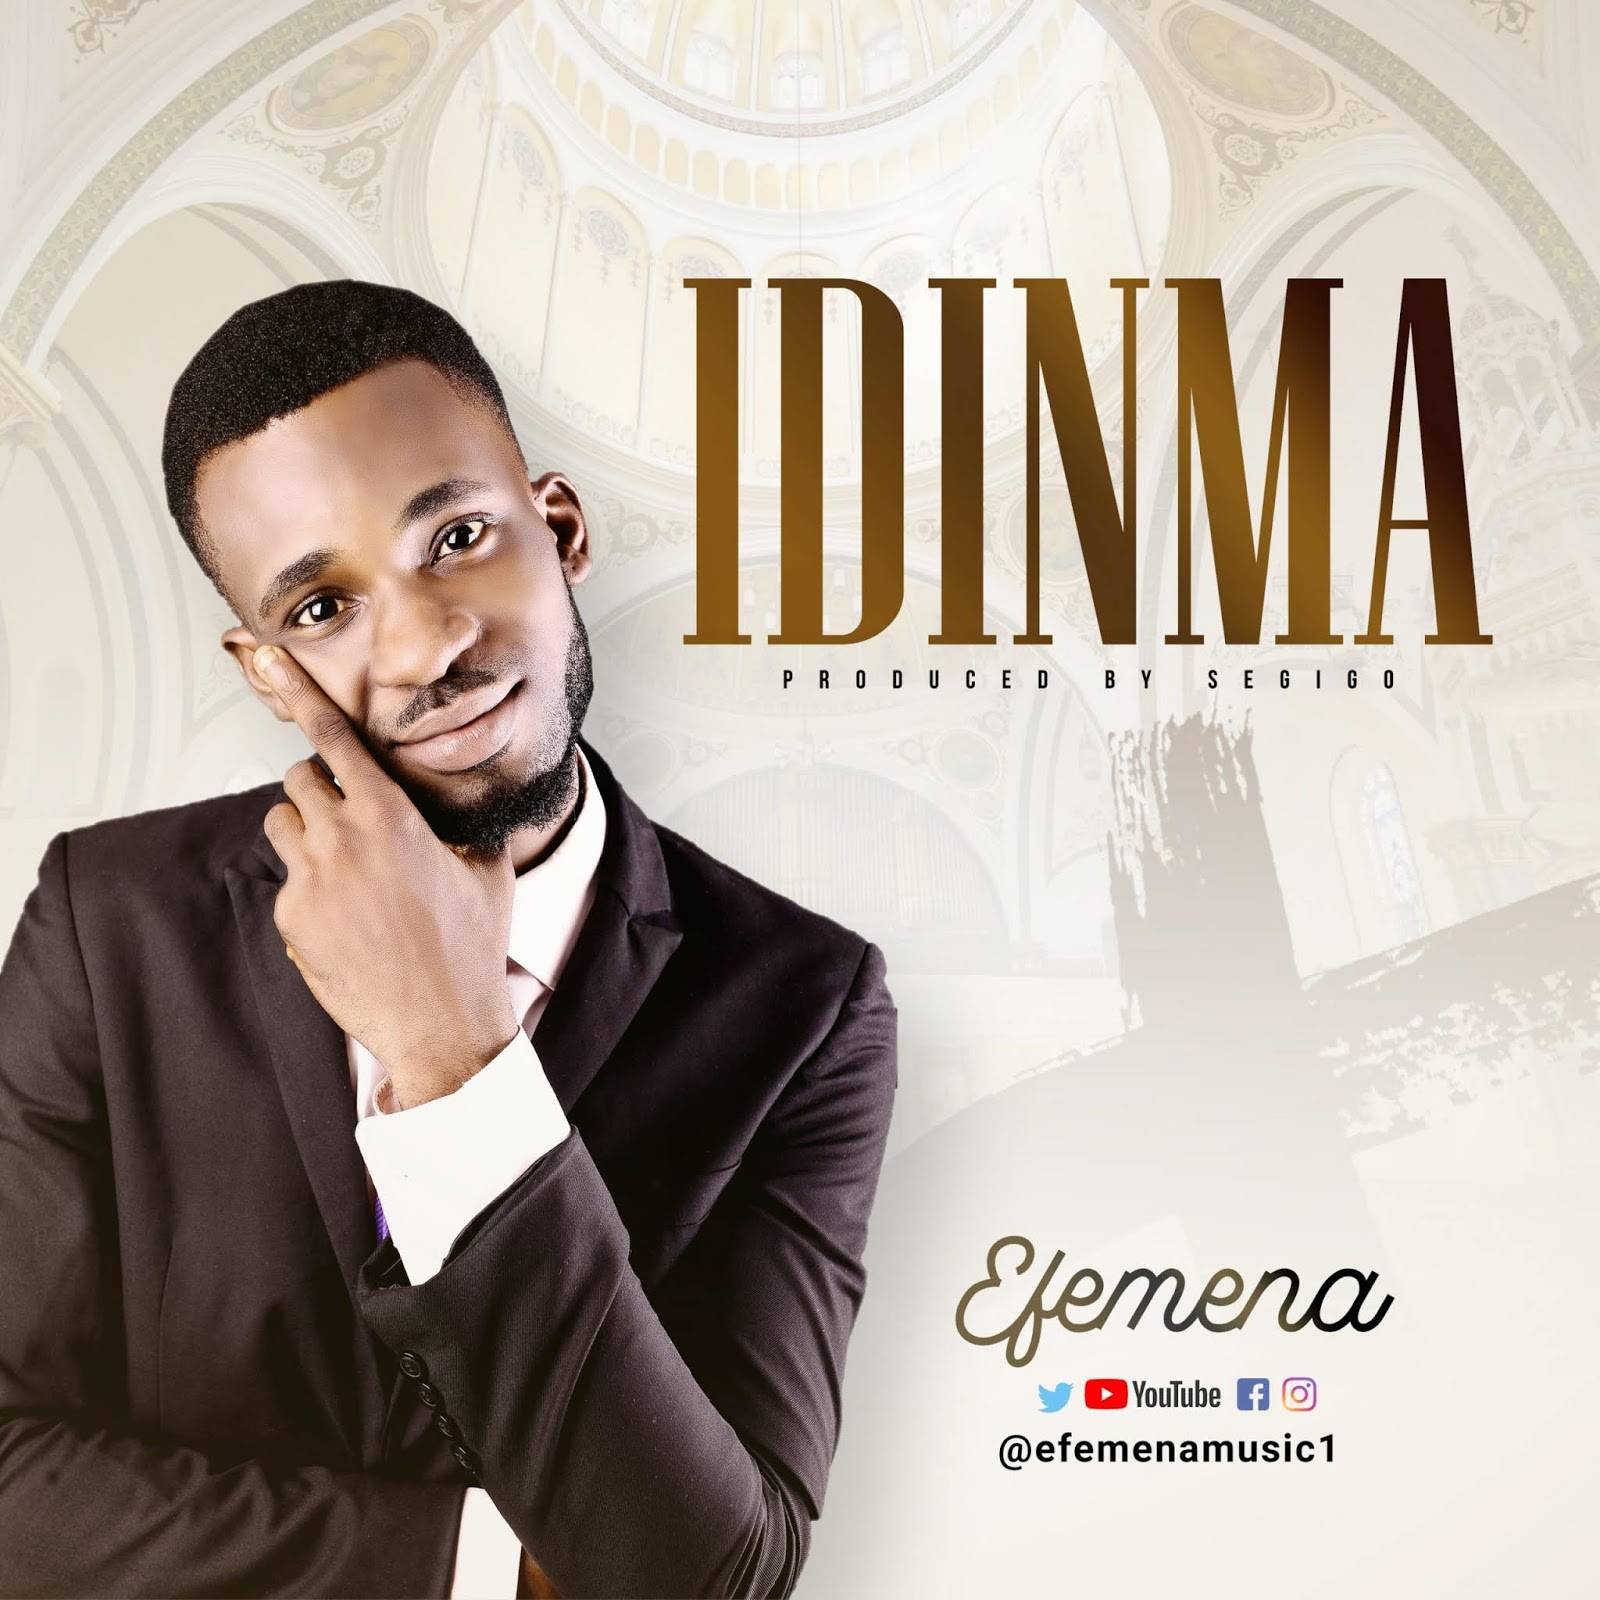 Efemena - Idinma Mp3 Download